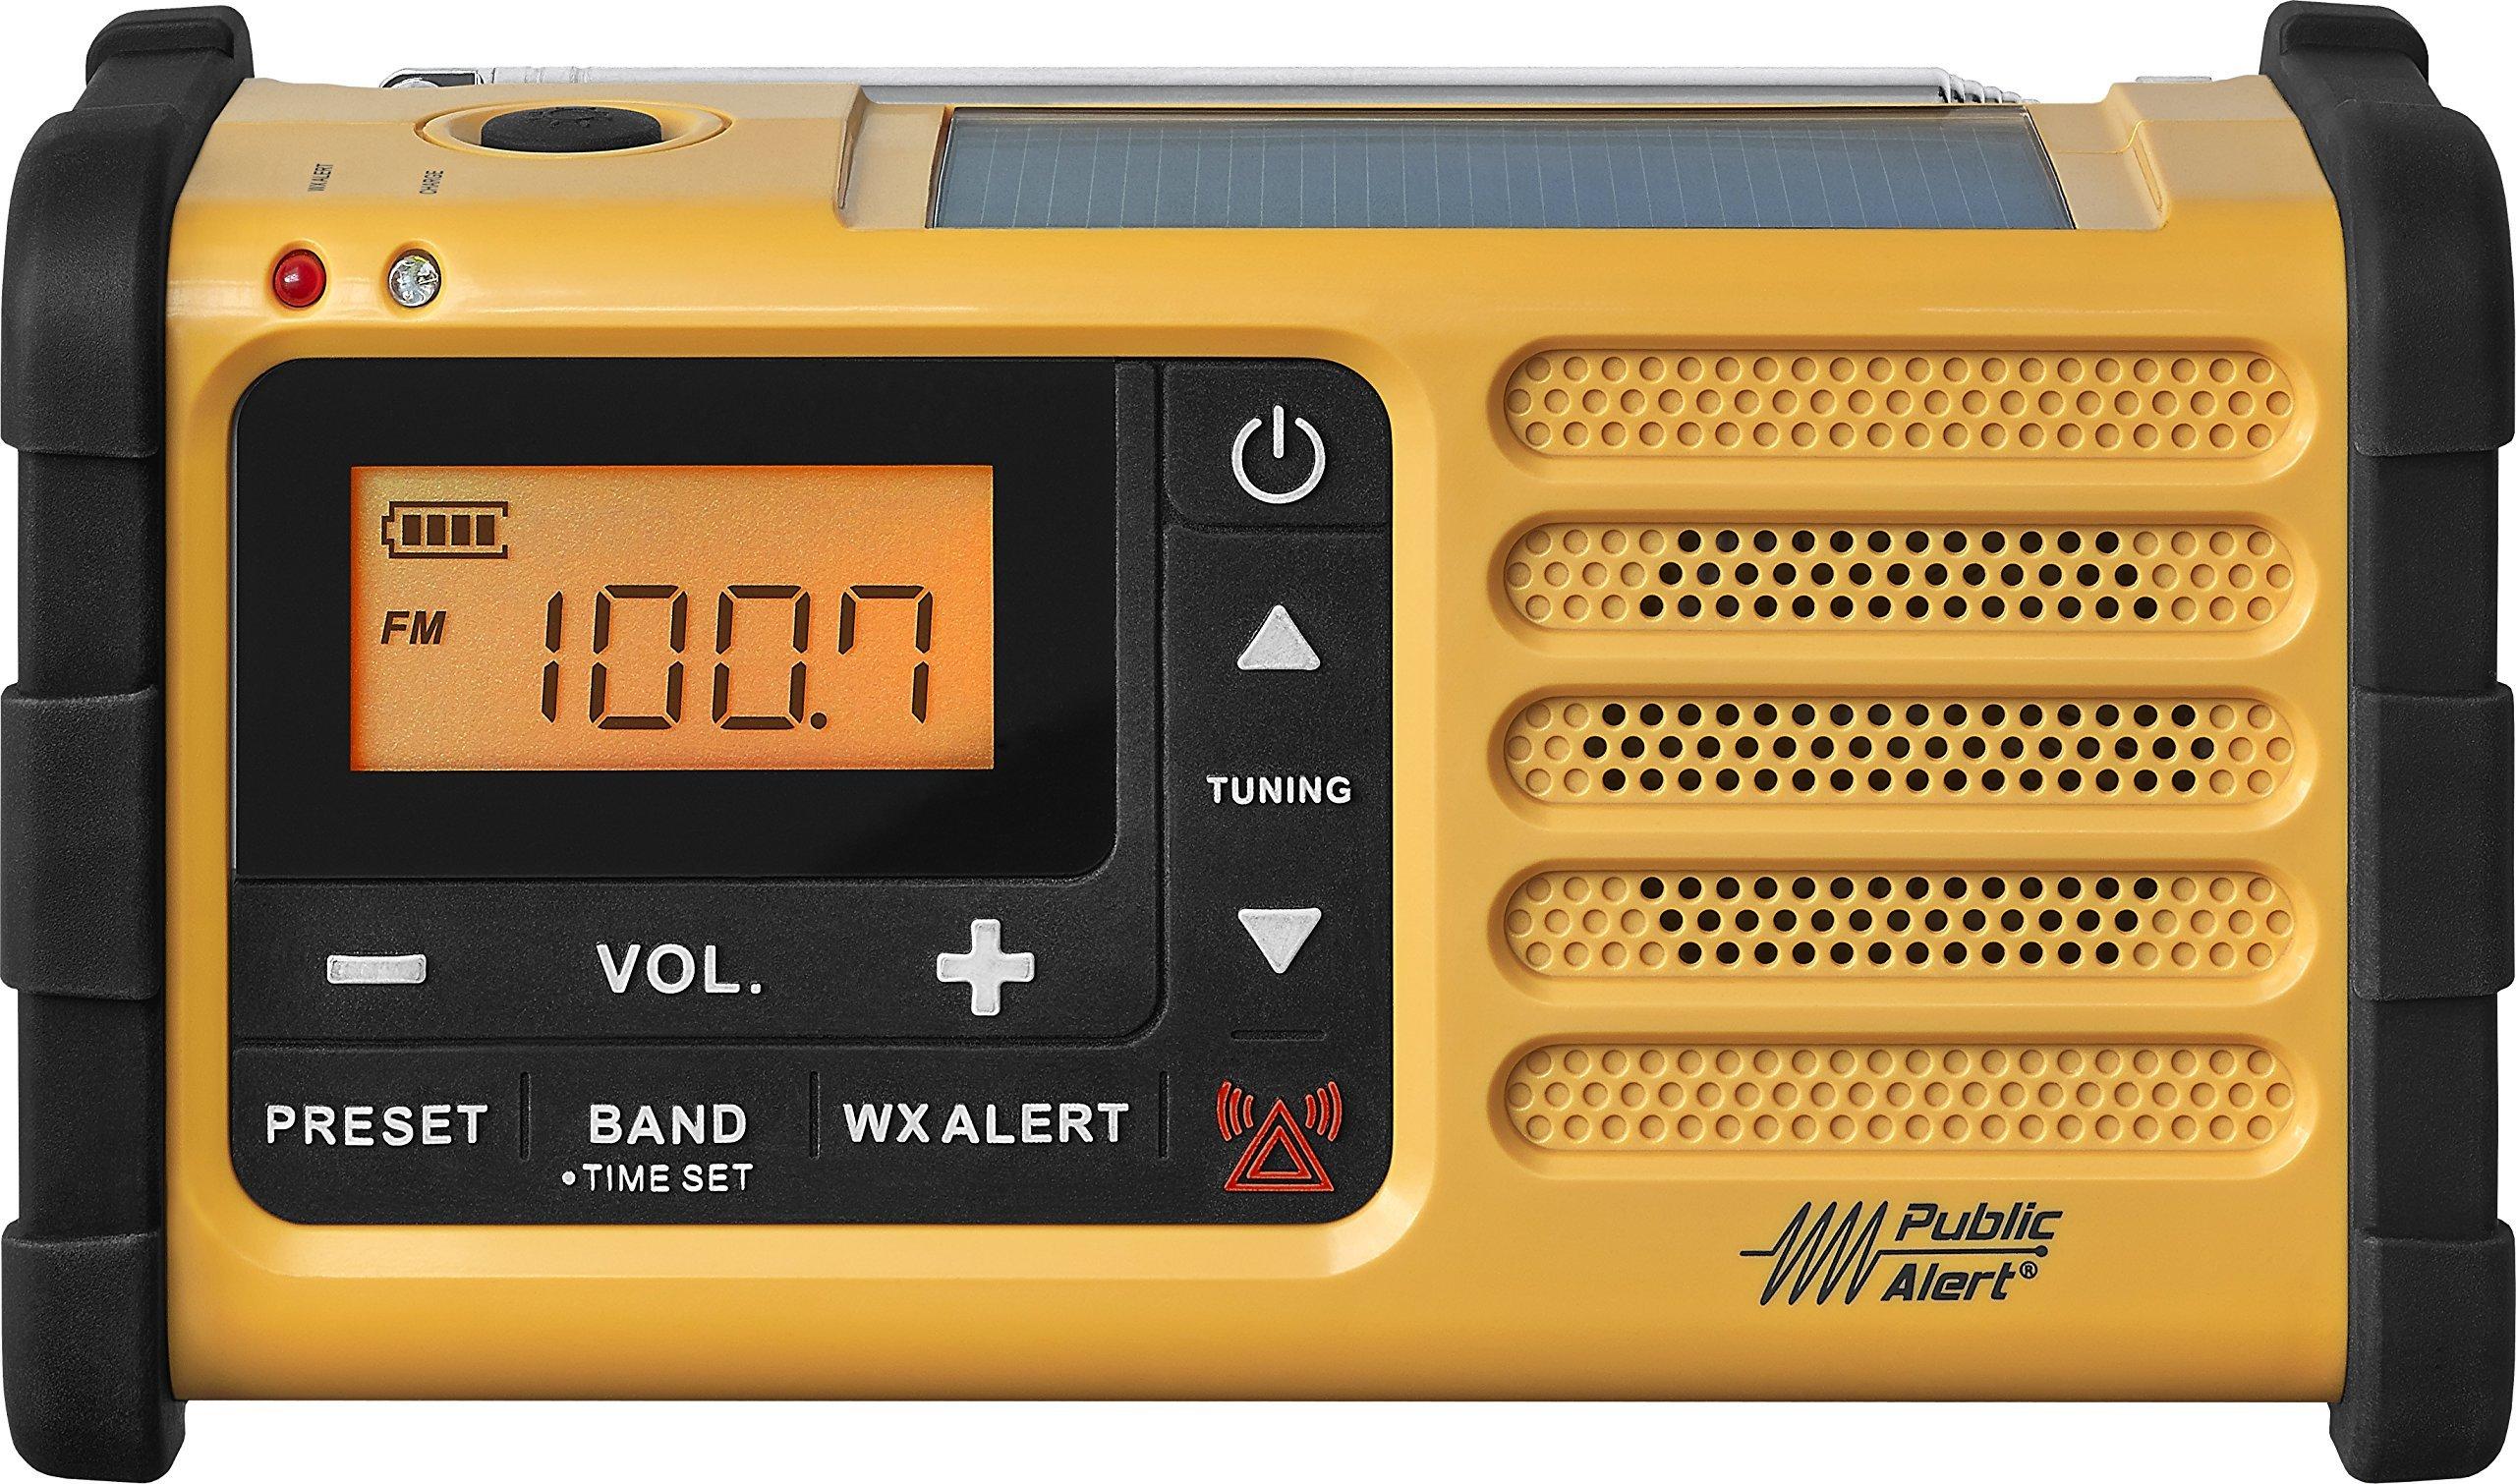 Sangean MMR-88 AM/FM/Weather+Alert Emergency Radio. Solar/Hand Crank/USB/Flashlight, Siren, Smartphone Charger (Certified Refurbished)